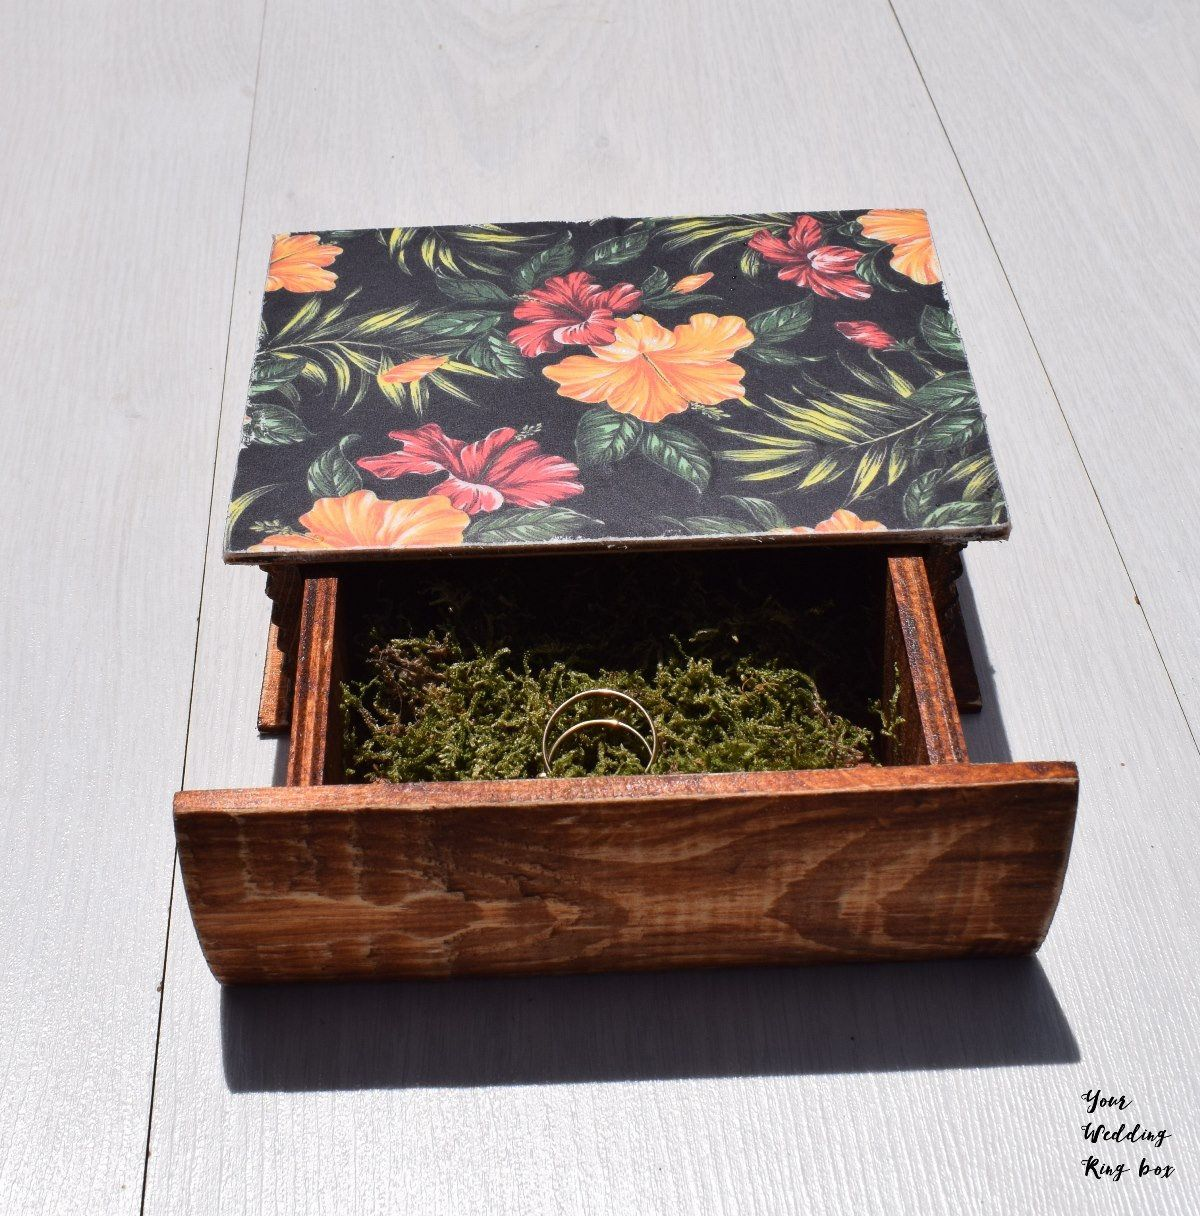 Hawaii wedding ring bearer box, destination wedding ideas